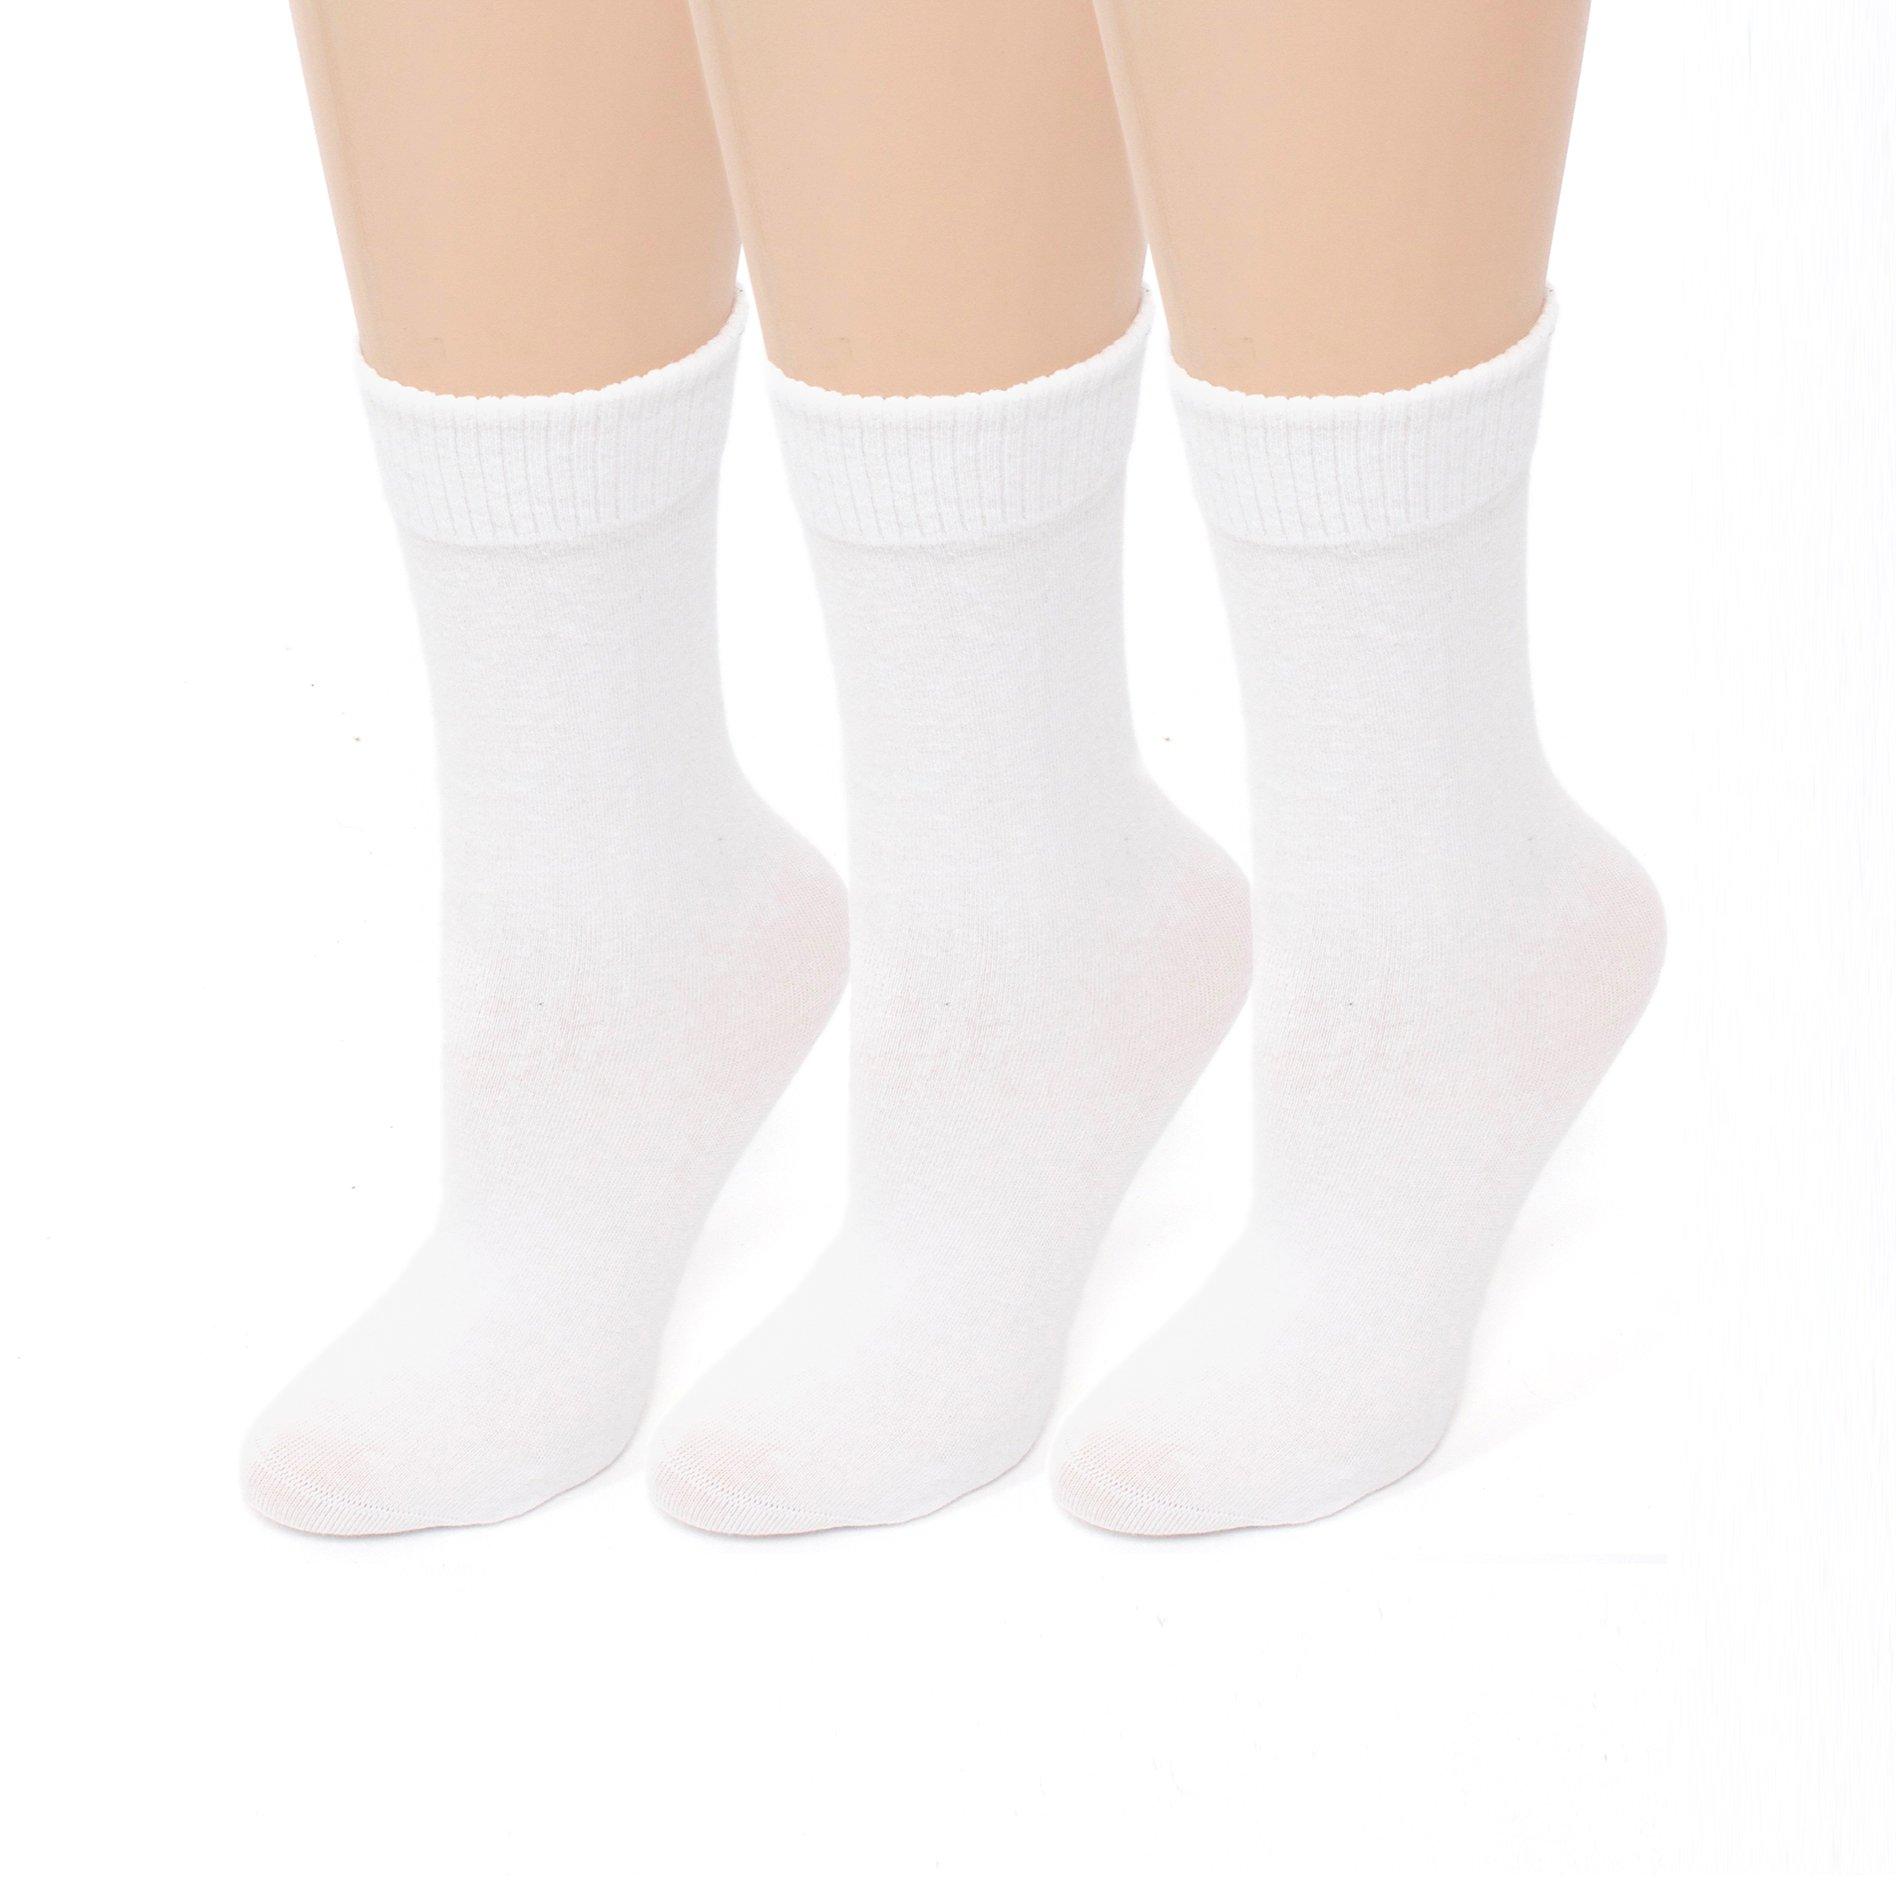 Diabetic Socks | Womens White Crew 3 Pack | Seamless Toe Size 9-11